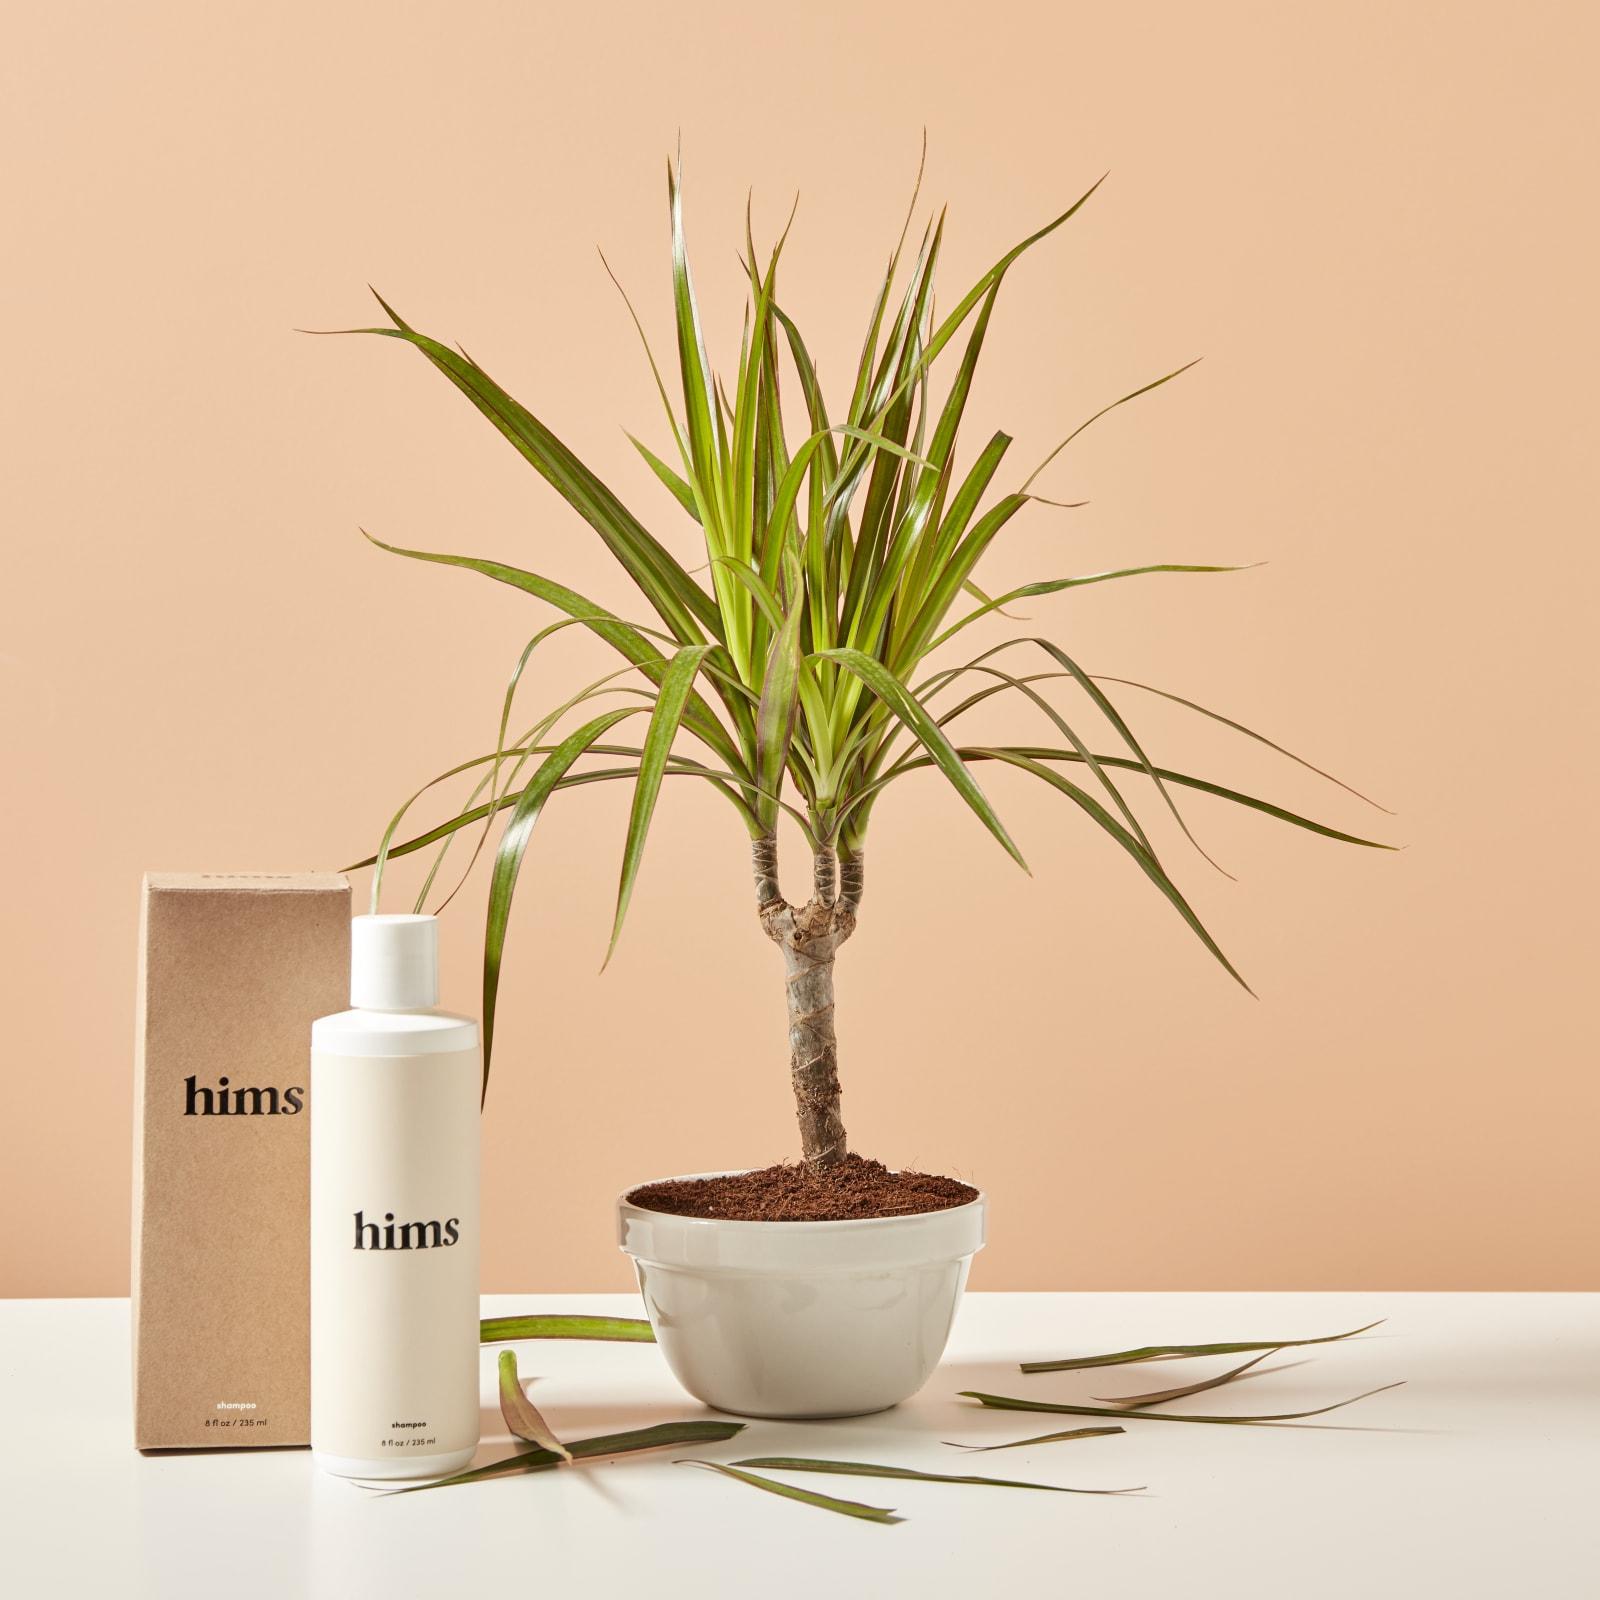 shampoo bottle with plant